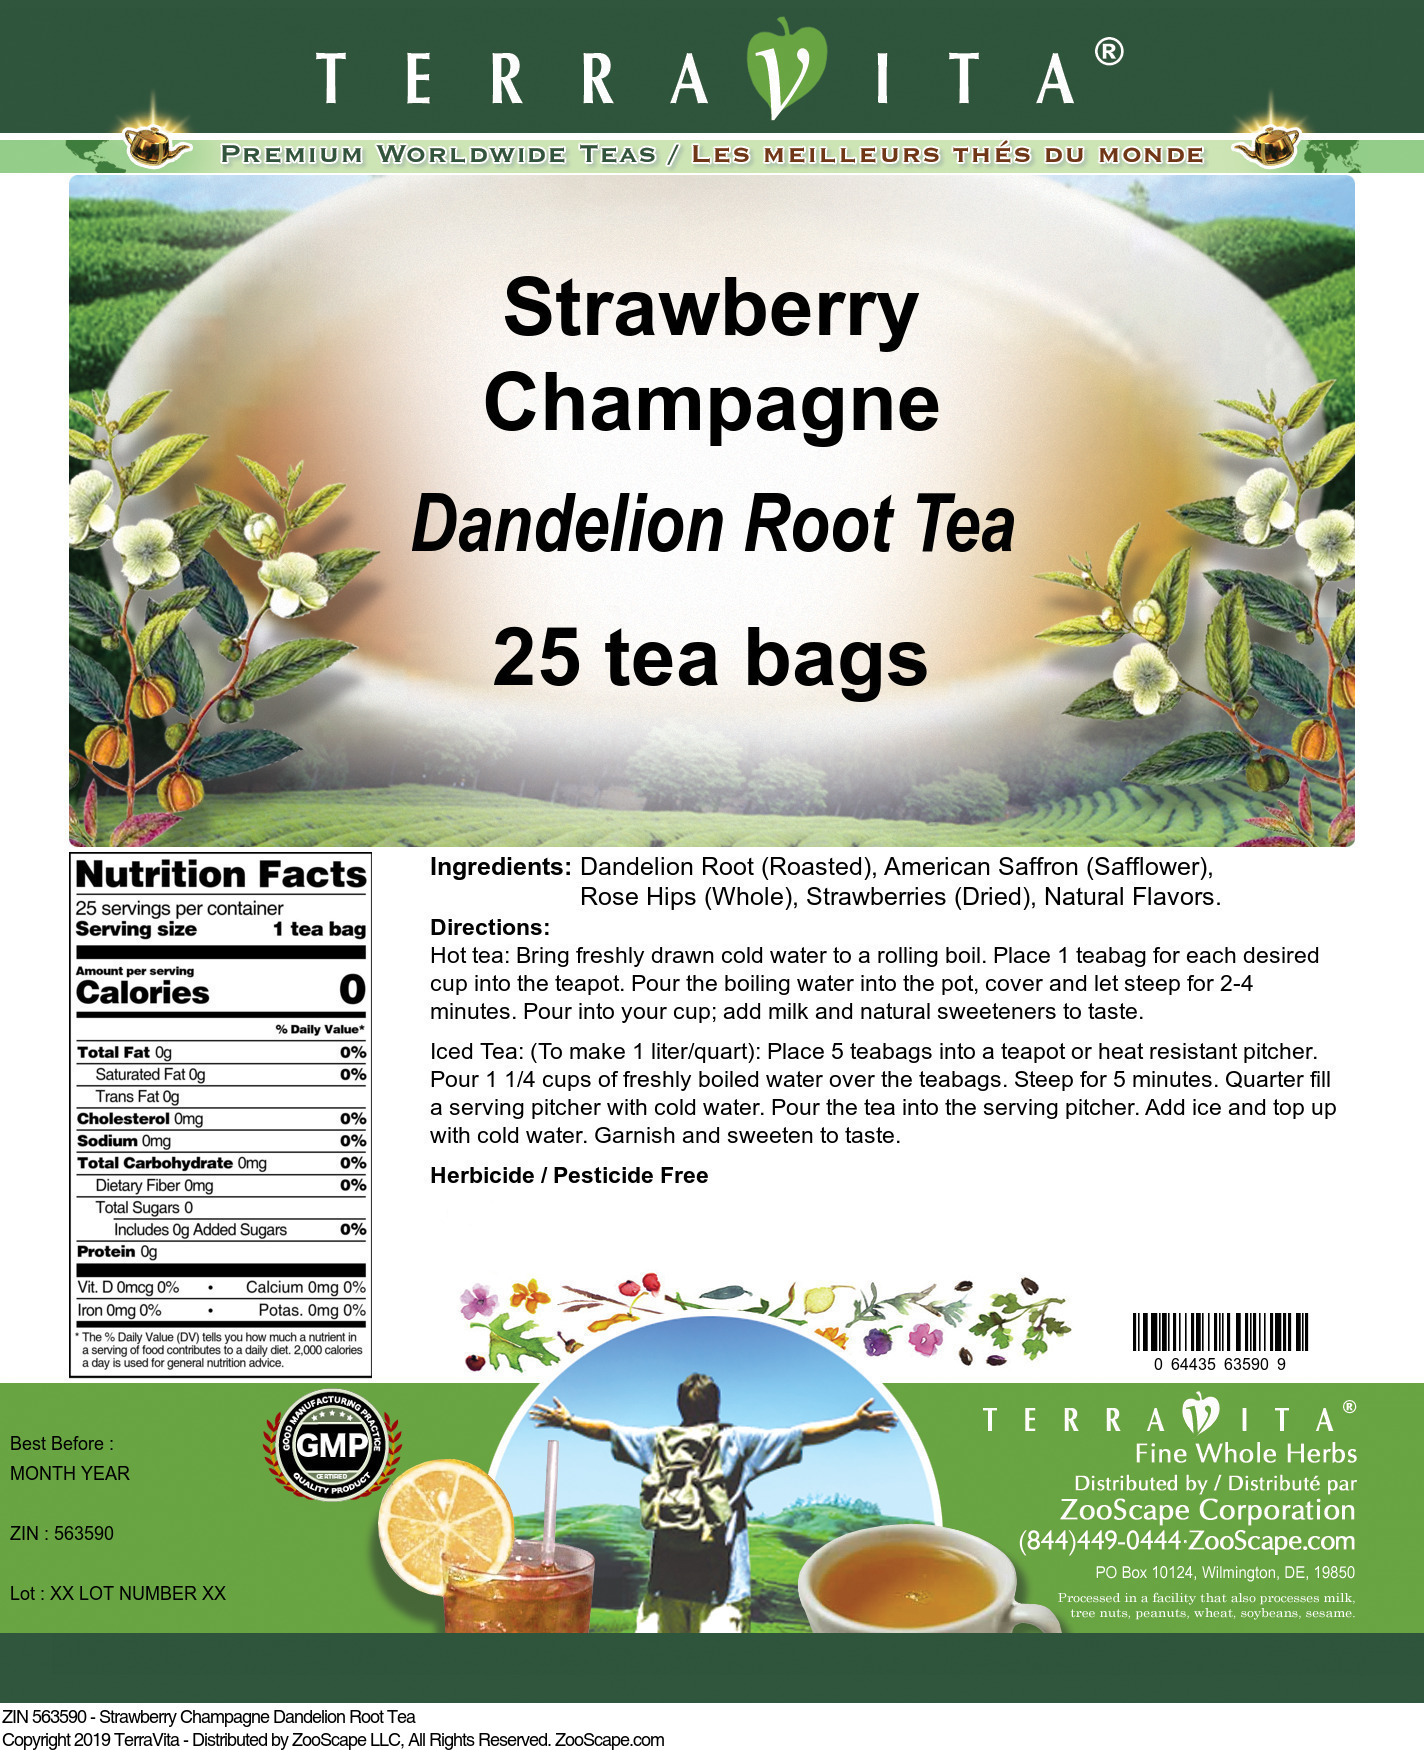 Strawberry Champagne Dandelion Root